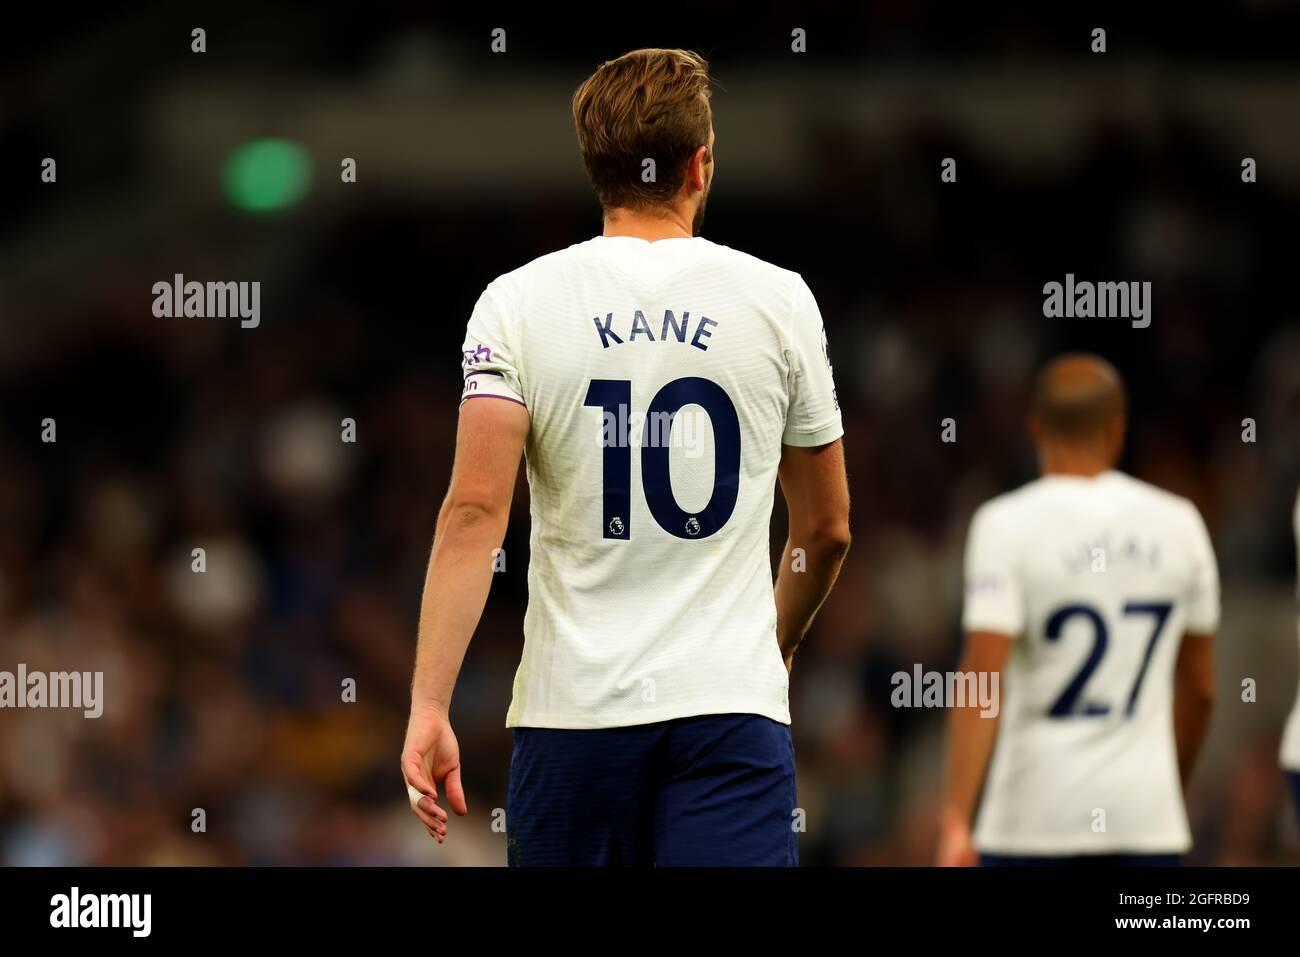 Tottenham Hotspur Stadium, London, UK. 26th Aug, 2021